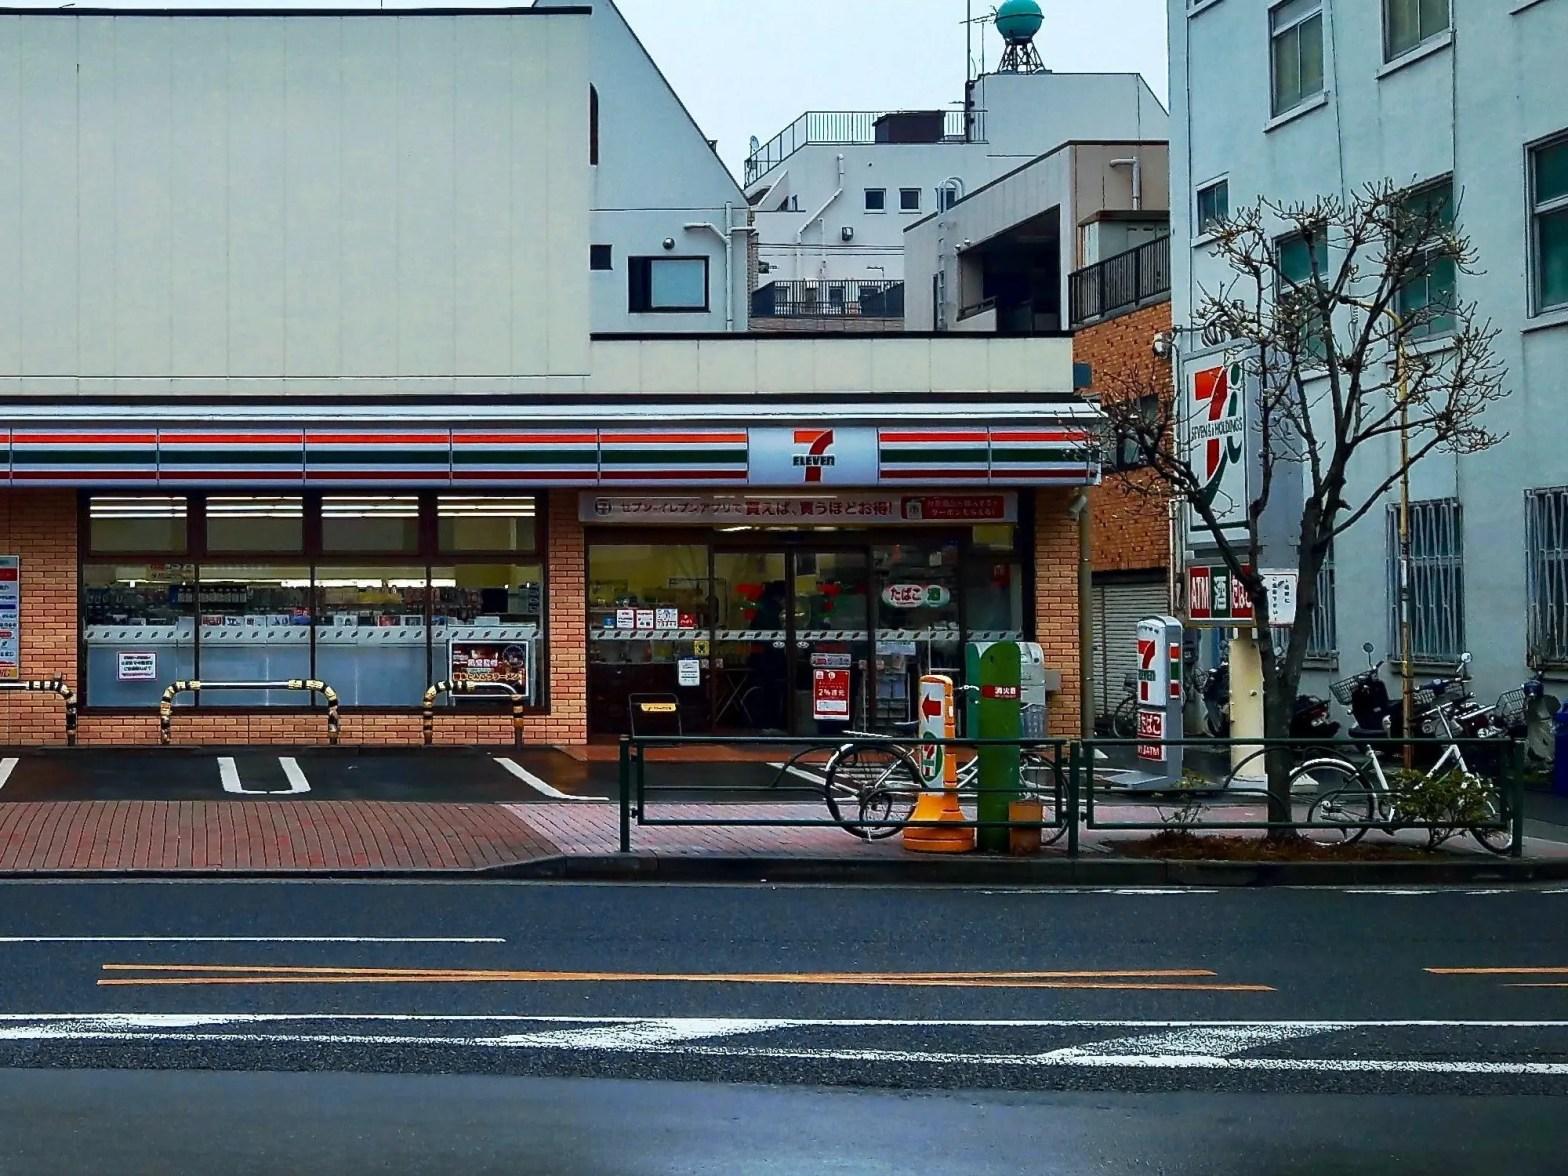 Japan, land van gemak: convenience store